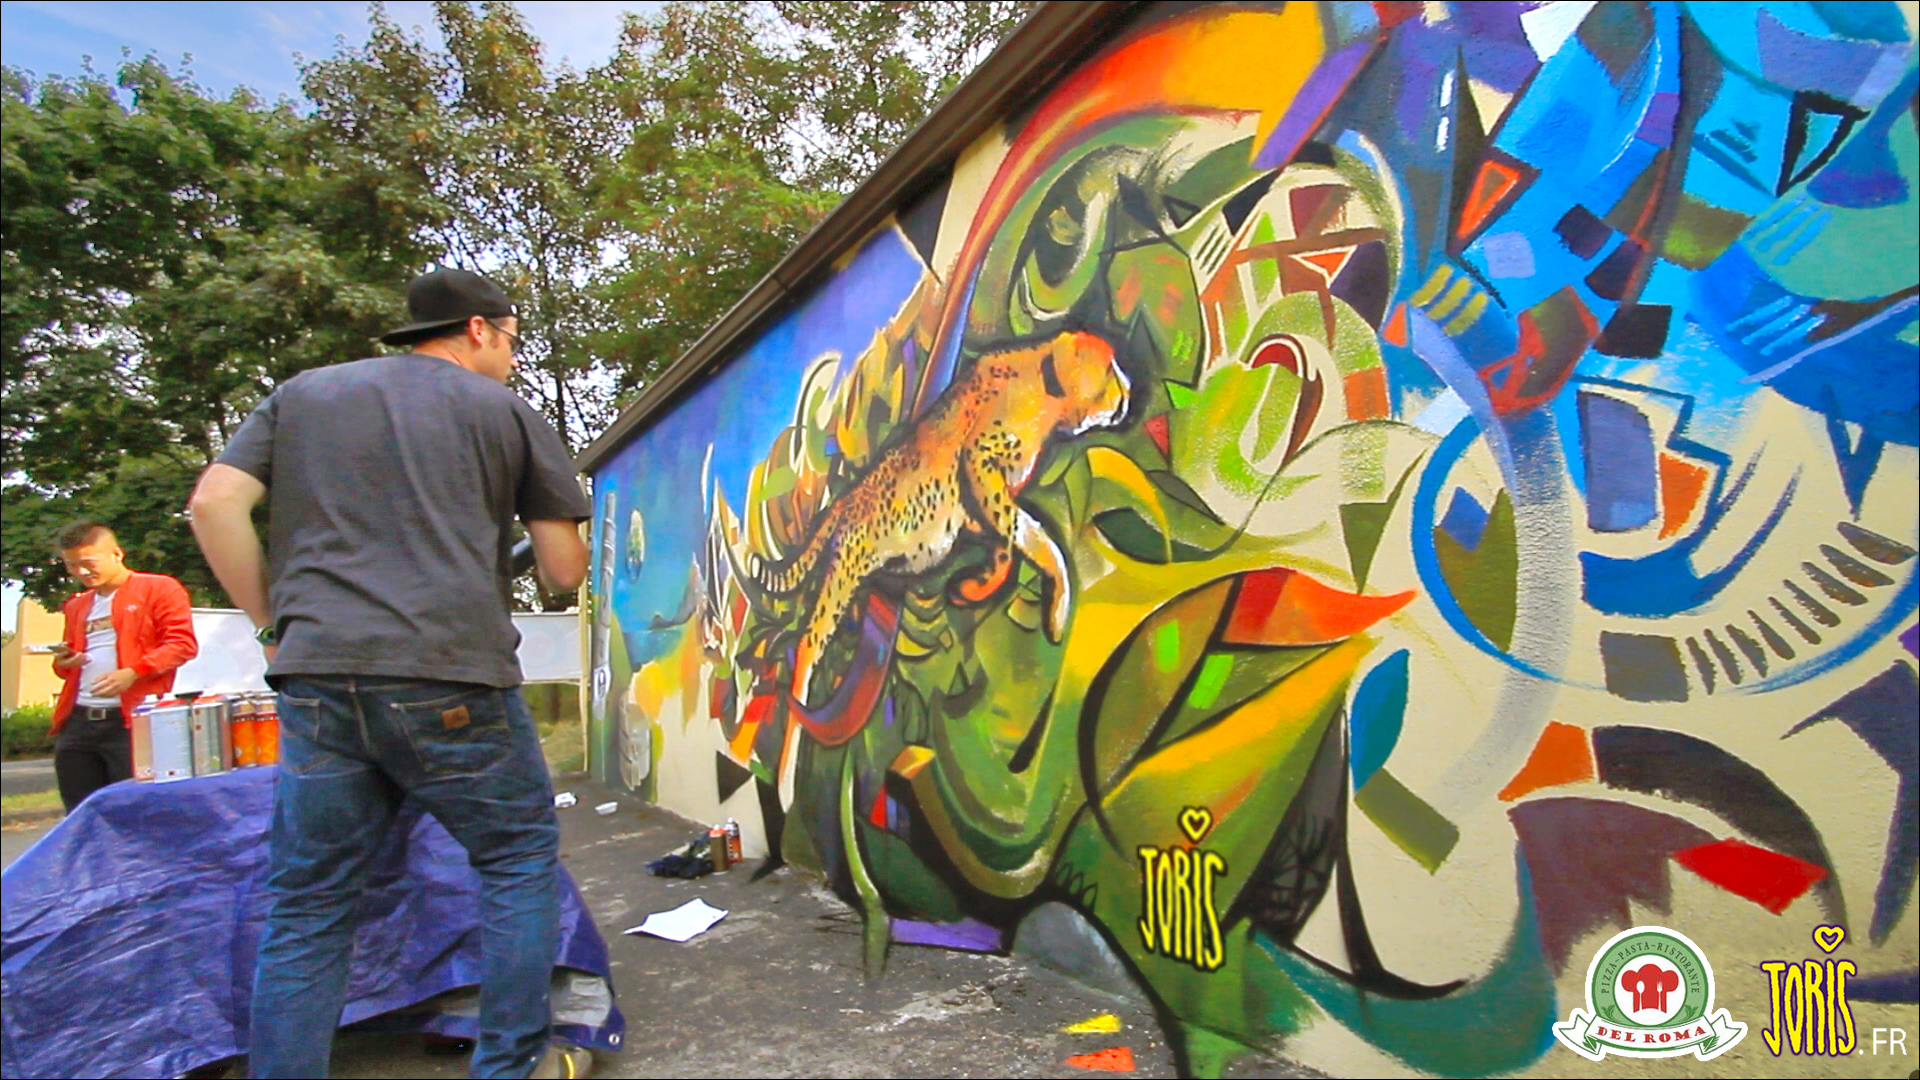 DECORATION-GRAFFITI-FRESQUE-TABLEAU-STREET-ART-PARIS-08